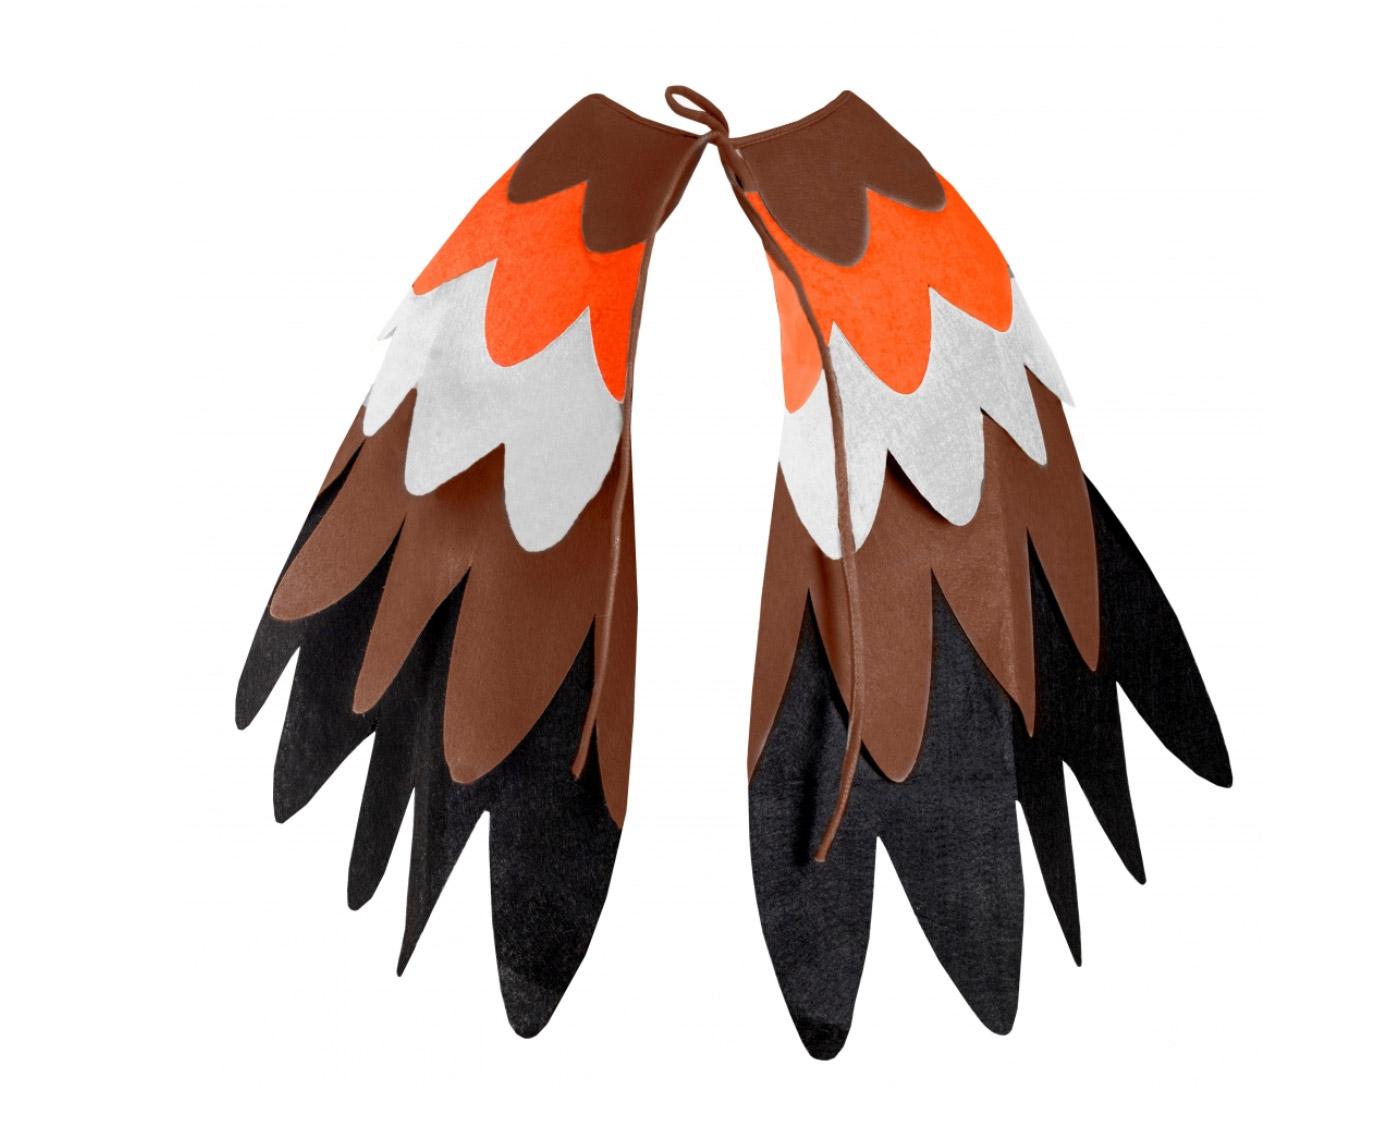 Vleugels 'Vilt Oranje/bruin'